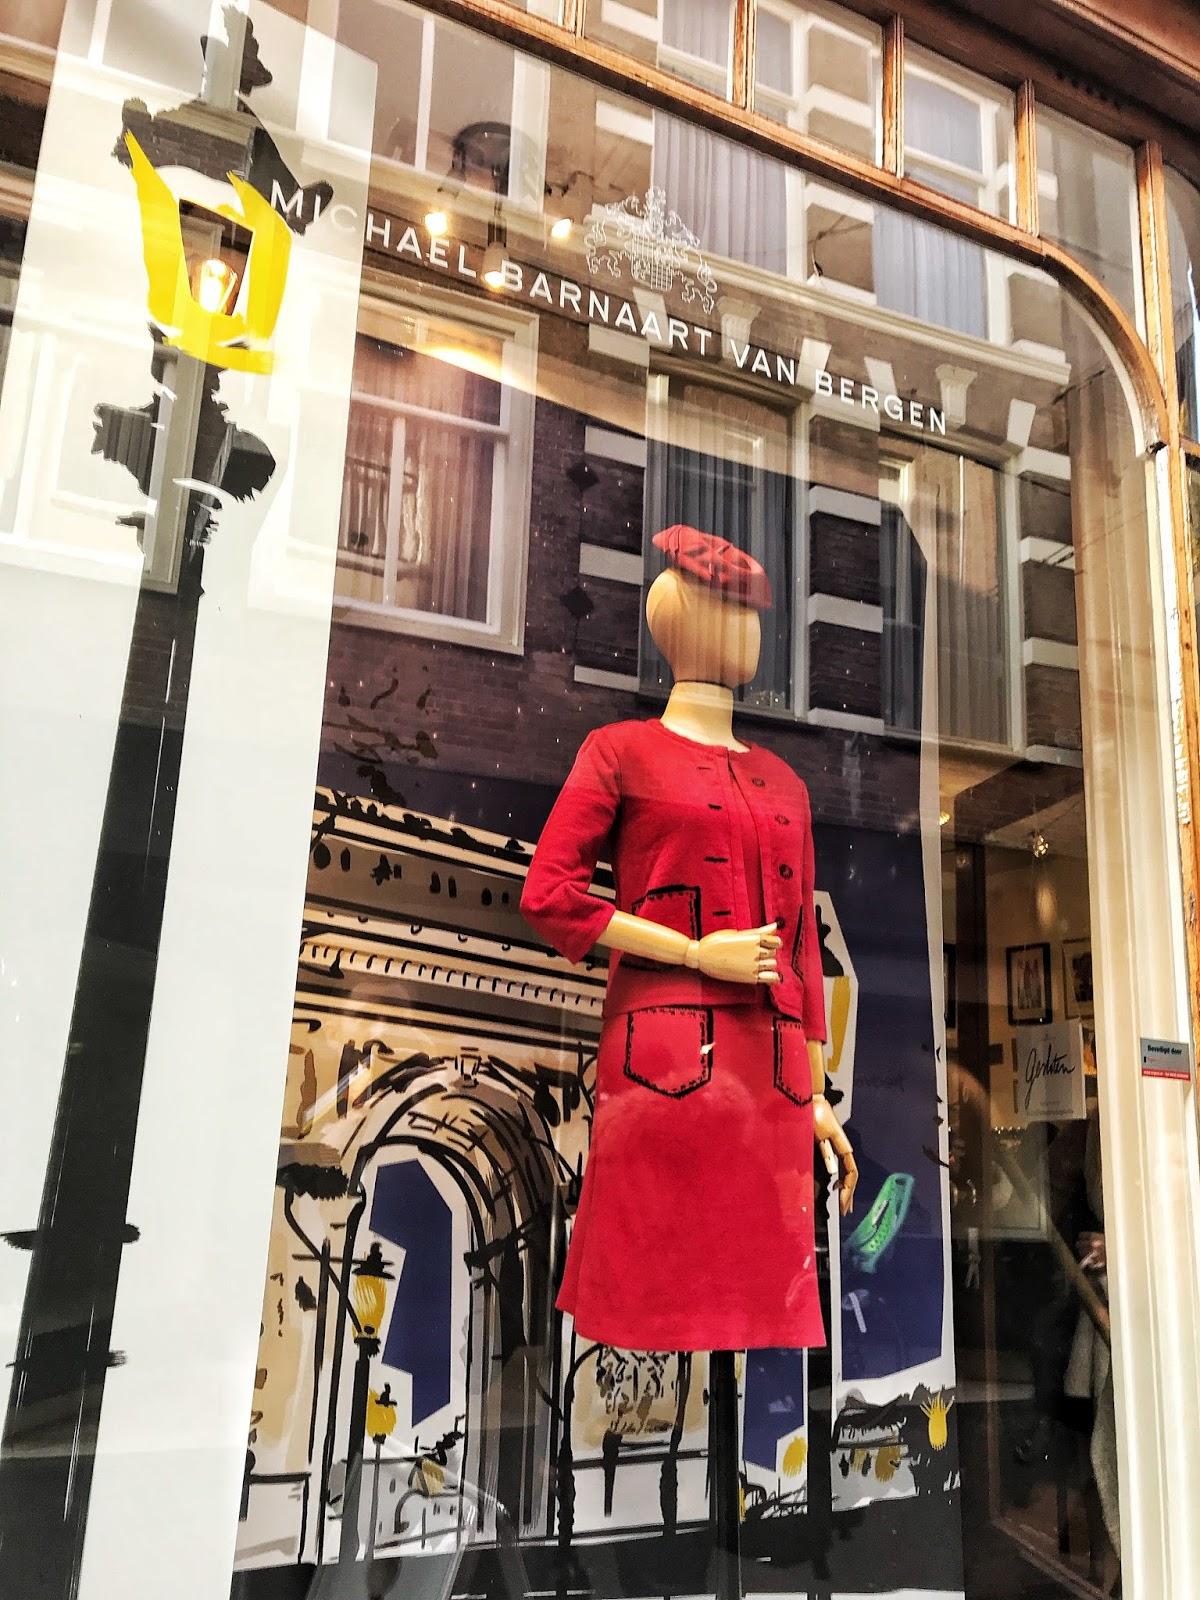 Audrey Hepburn fashion style in Michael Barnaart The Hague